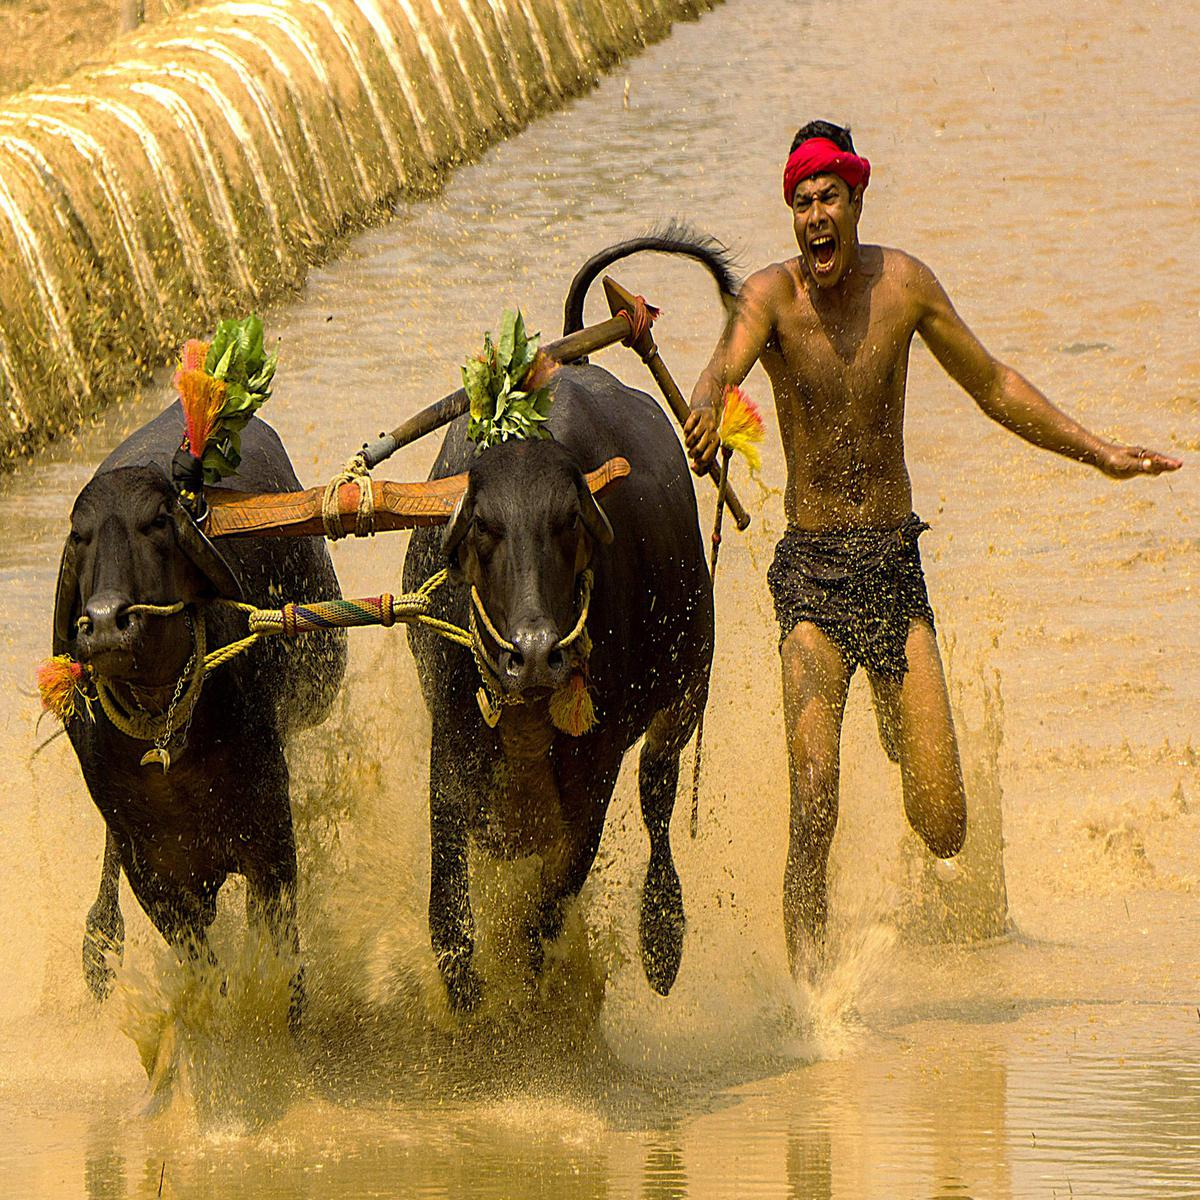 Image of Bovine, Working animal, Ox, Male, Vehicle, Water buffalo etc.